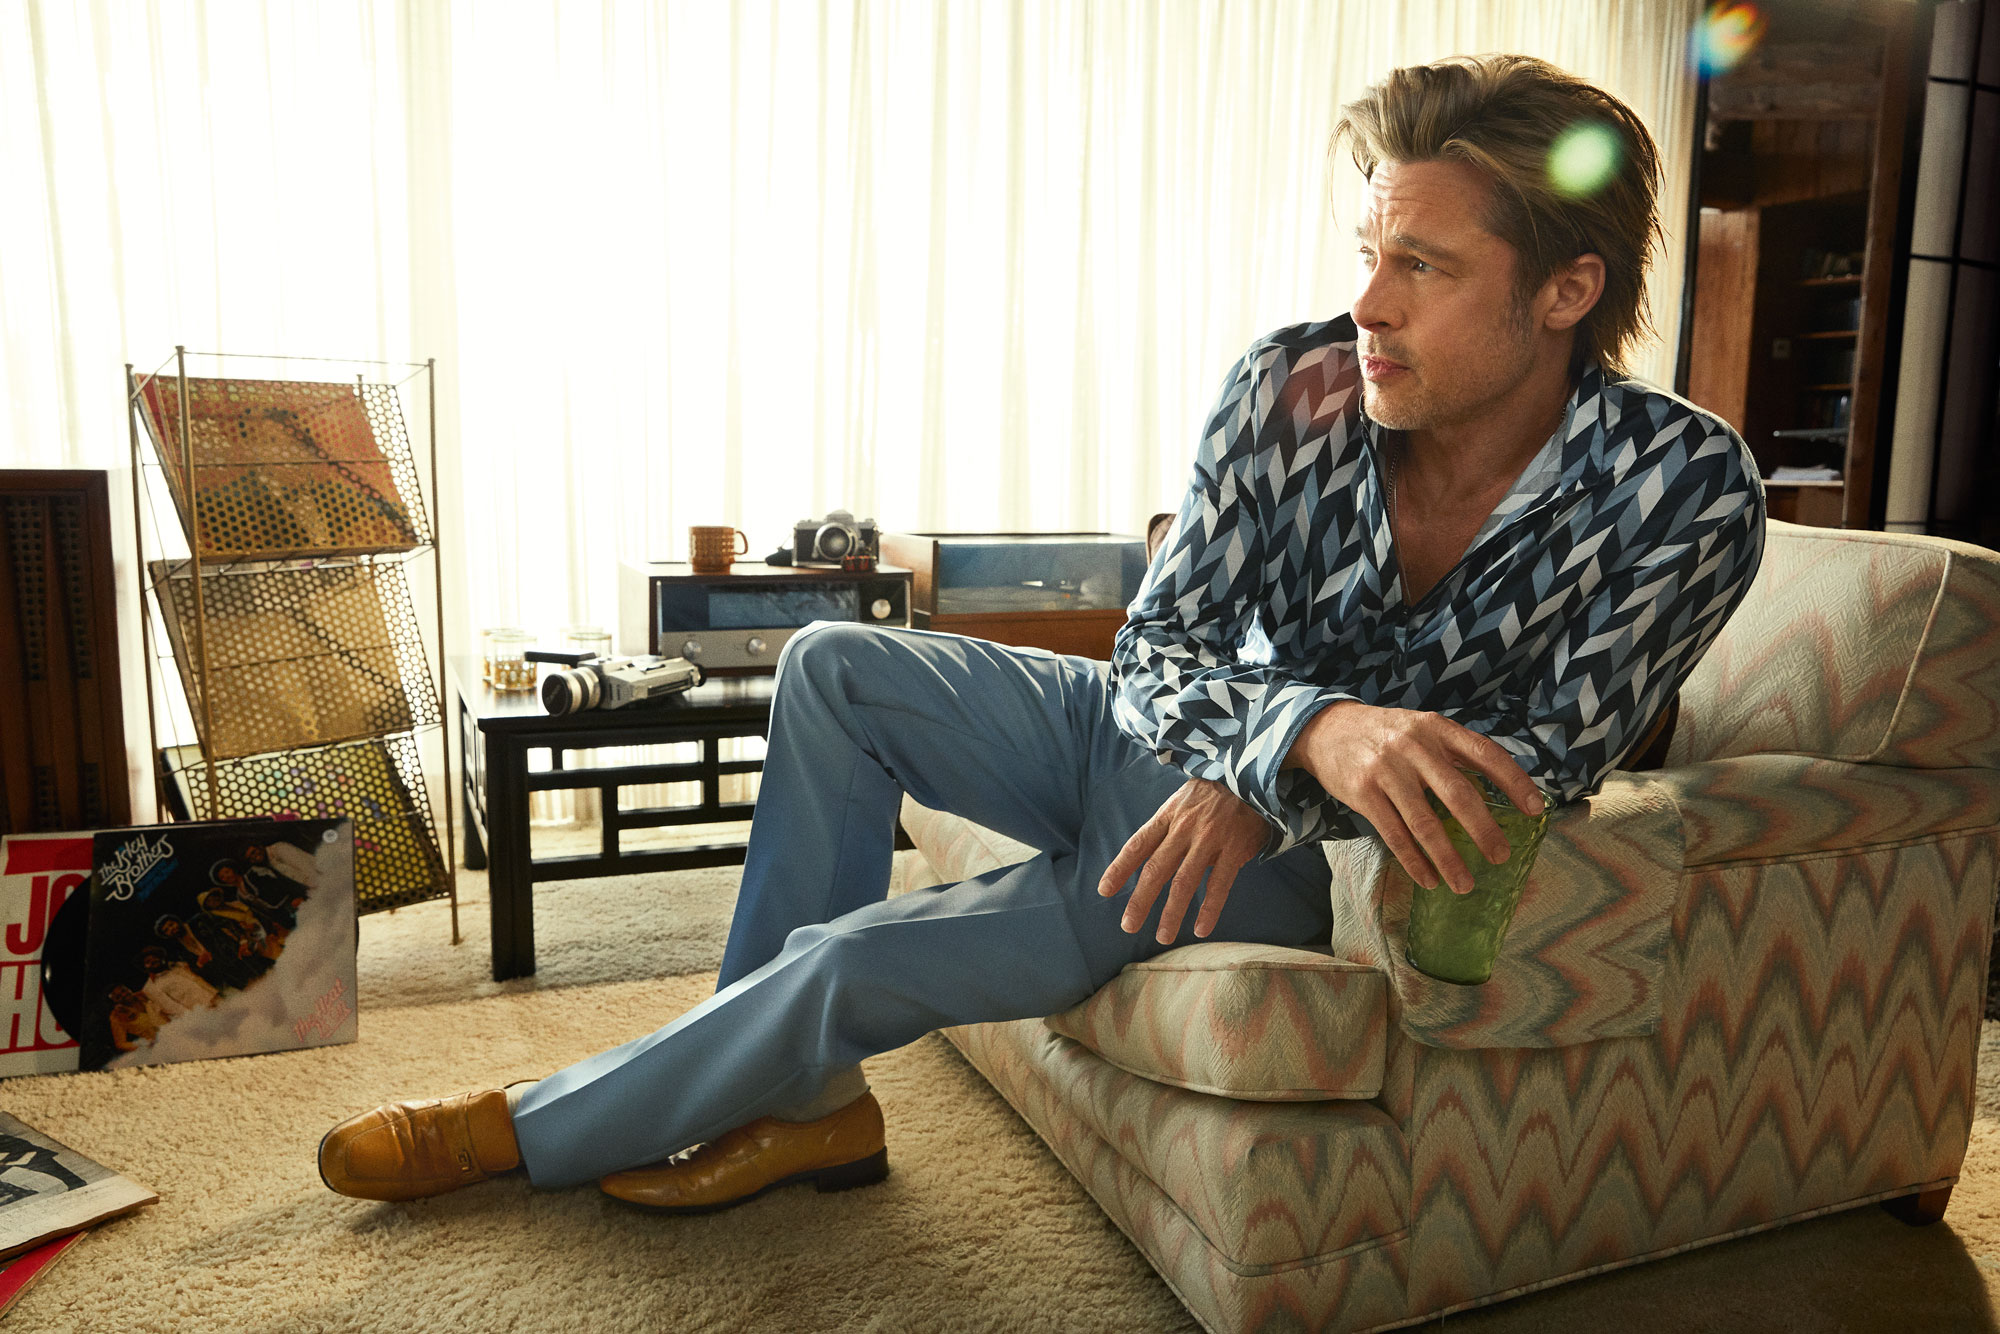 Рубашка Emporio Armani, брюки Prada, носки Gold Toe, винтажные лоферы Palace Costume & Prop Co.